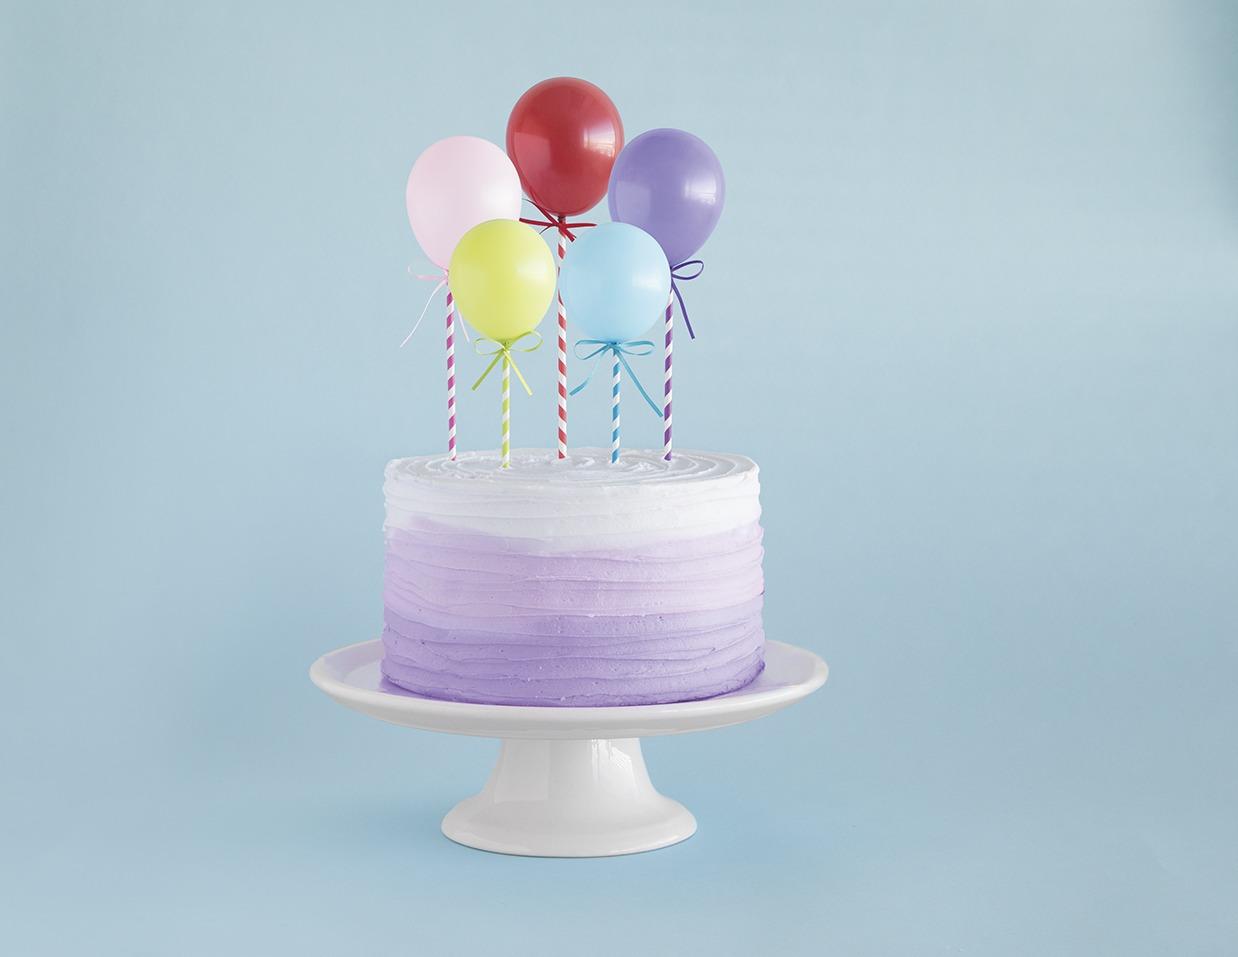 Mini Balloons Cake Topper - PartyWorld